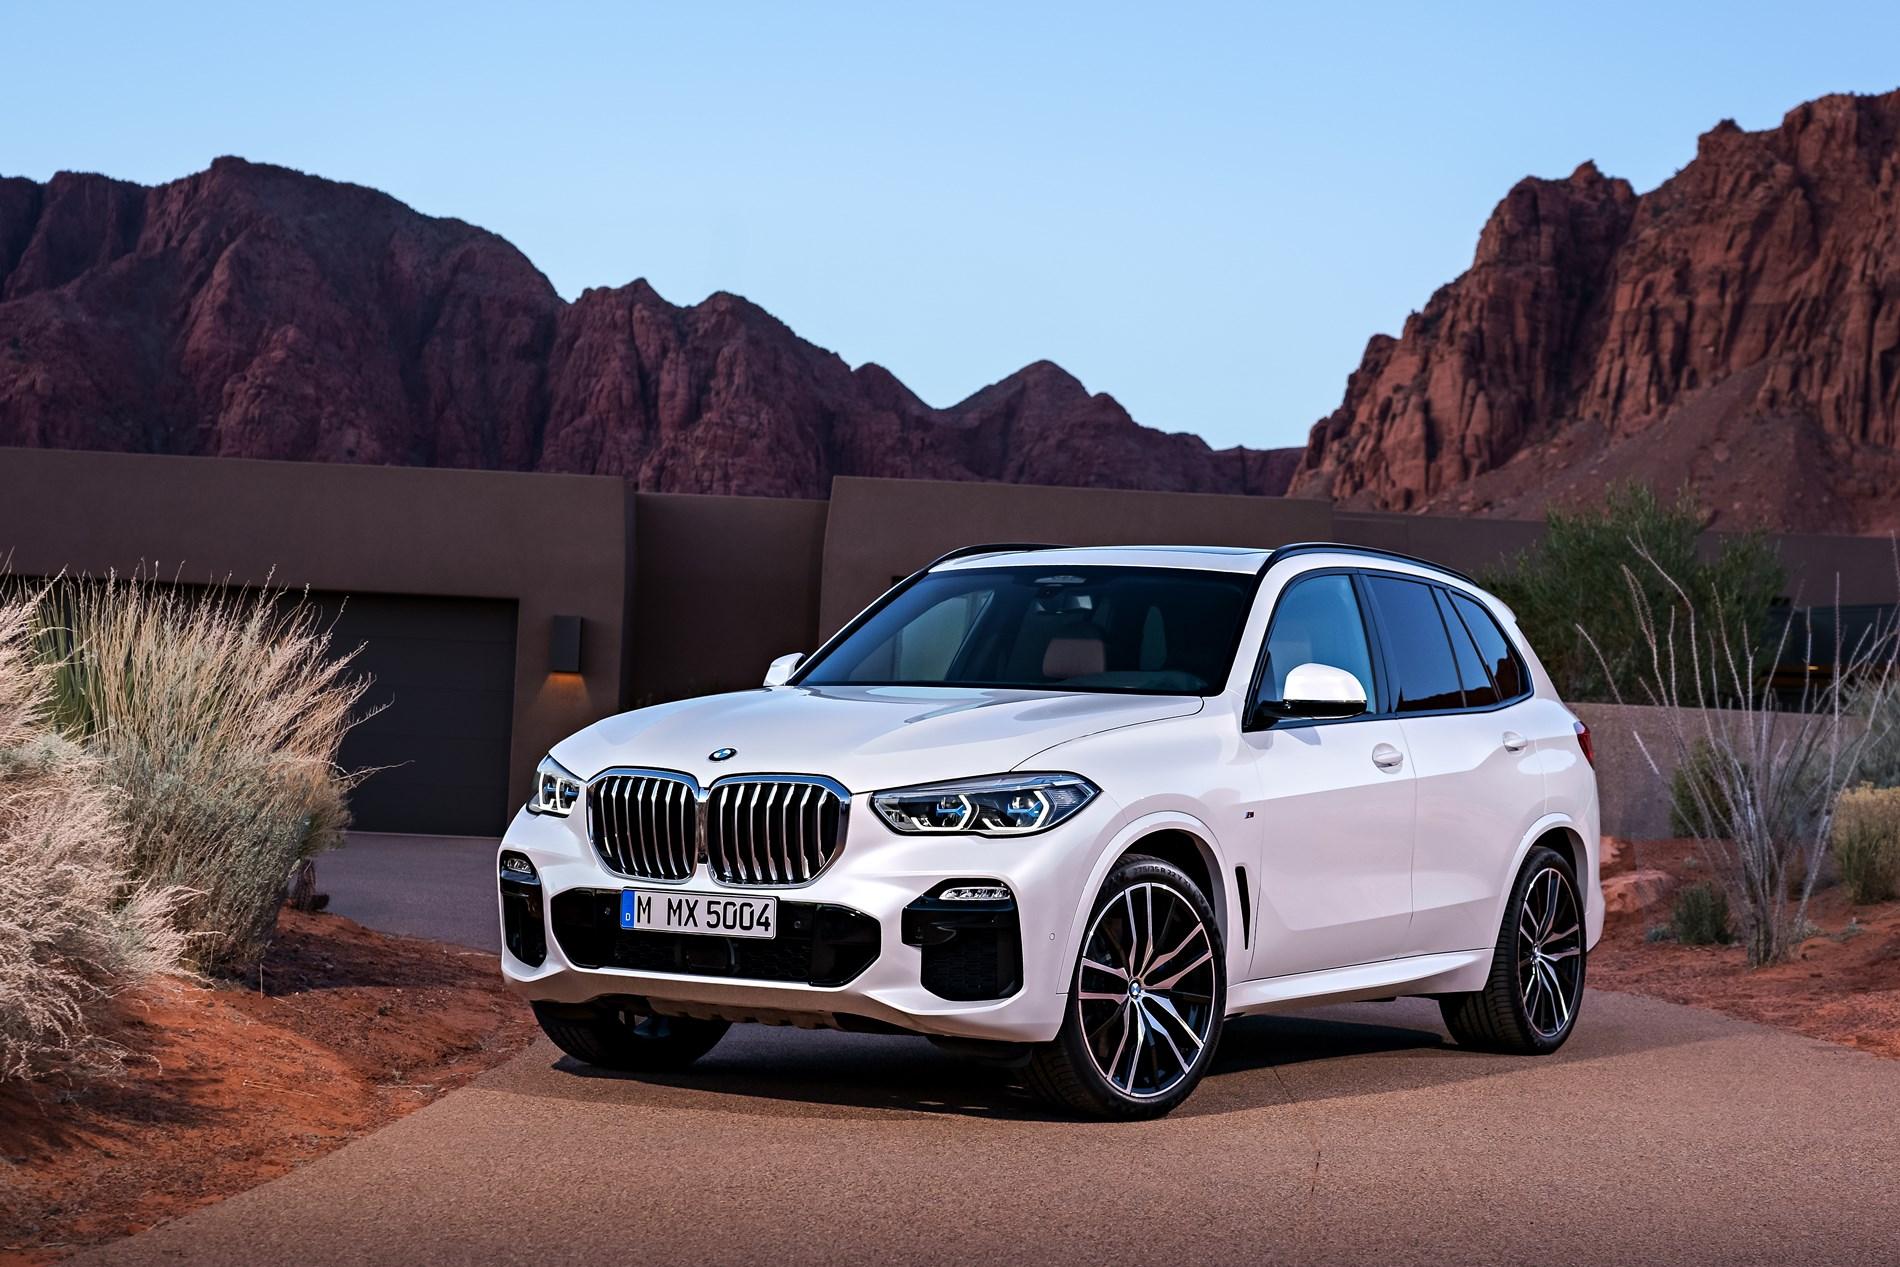 Efficiënte trekkracht: de nieuwe BMW X5 xDrive40d en de nieuwe BMW X6 xDrive40d met 6-cilinder-in-lijn dieselmotor en Mild-Hybrid technologie.